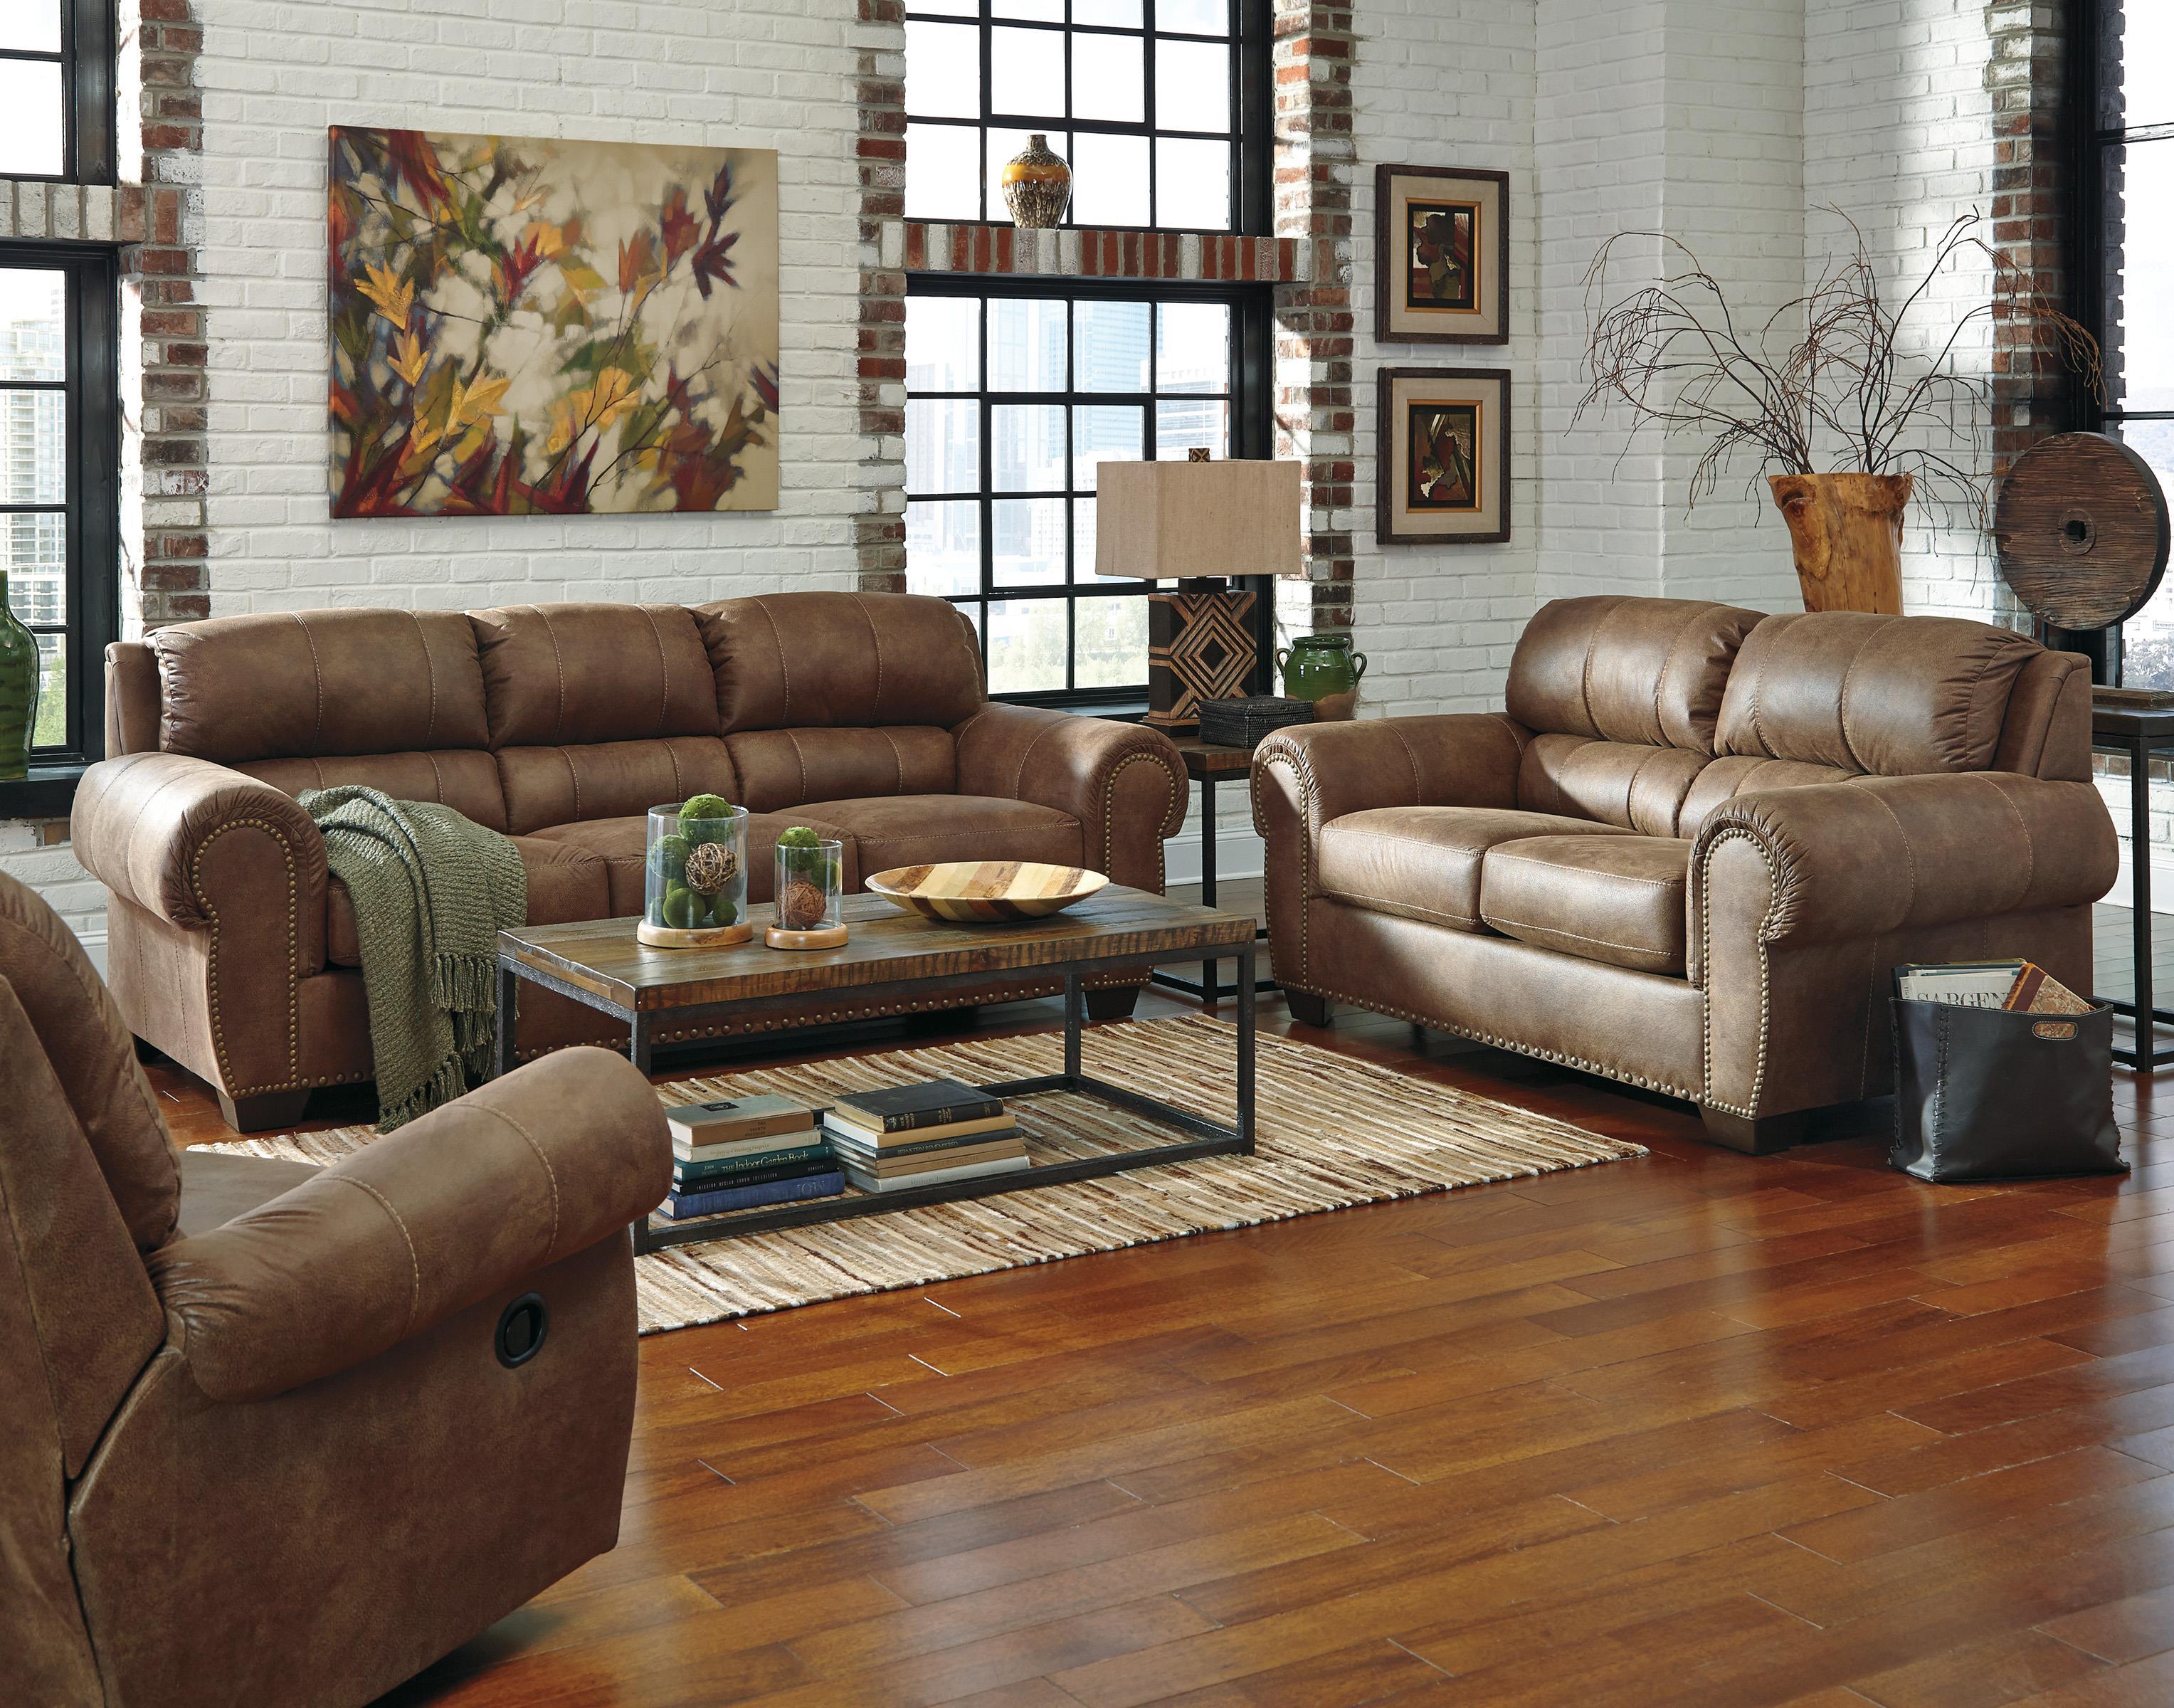 Benchcraft Burnsville Stationary Living Room Group - Item Number: 97206 Living Room Group 2